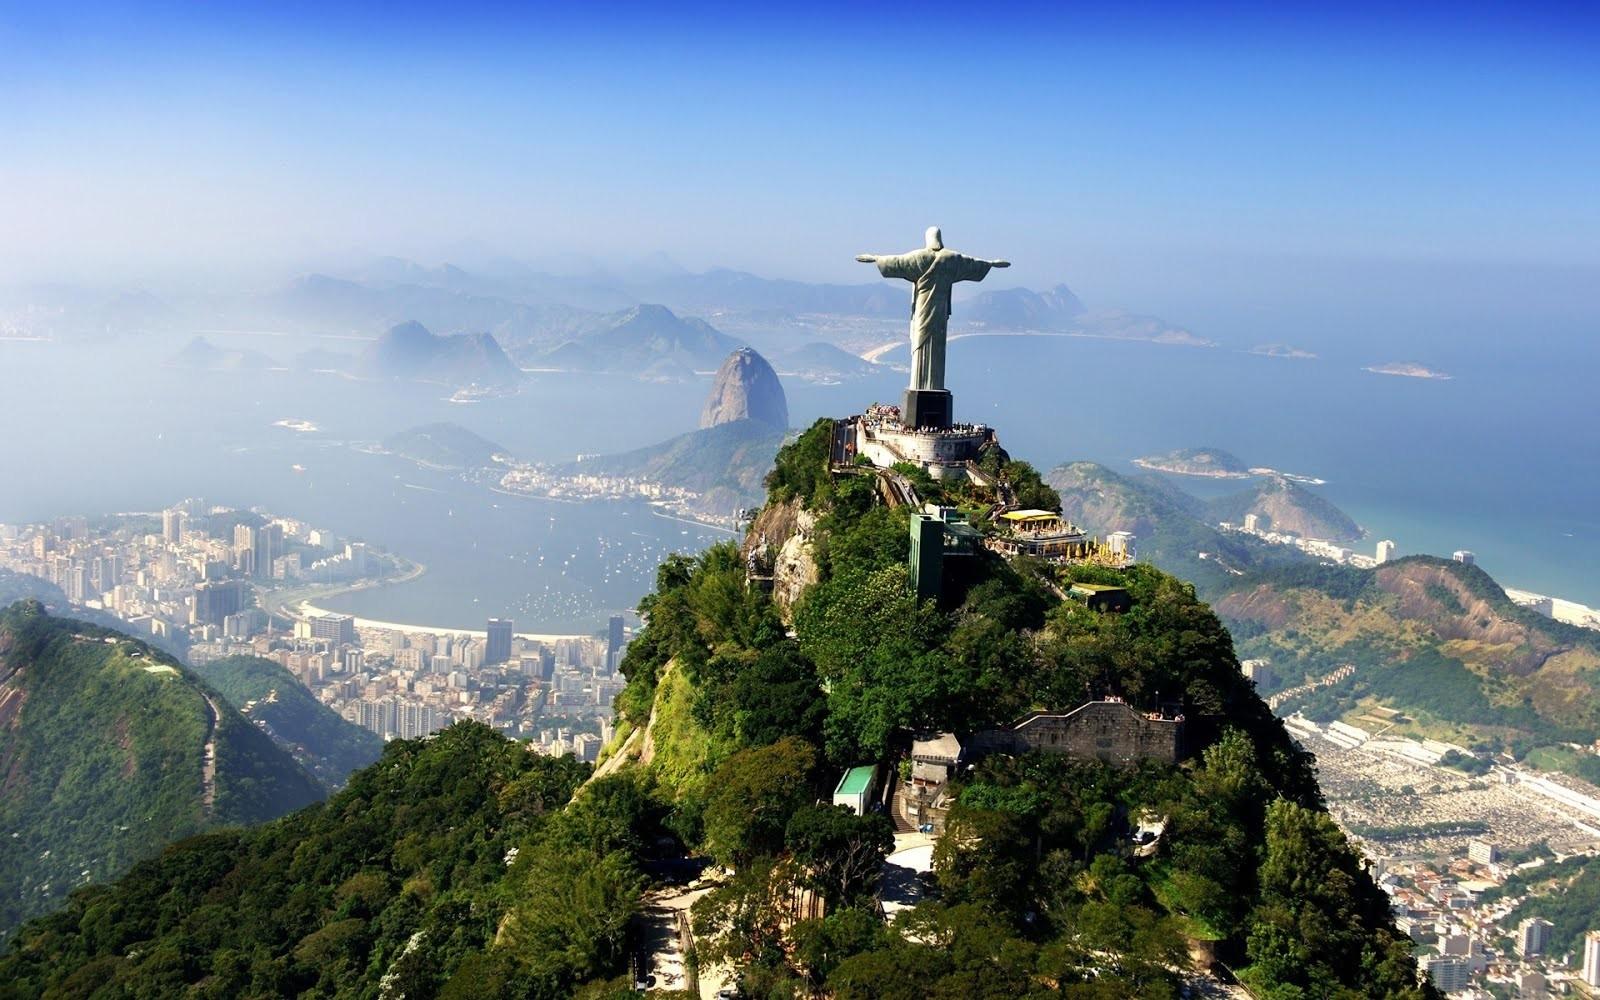 estatua-de-jesucristo-en-brasil-brazil-jesus-christ-statue-1920x1200-wallpaper